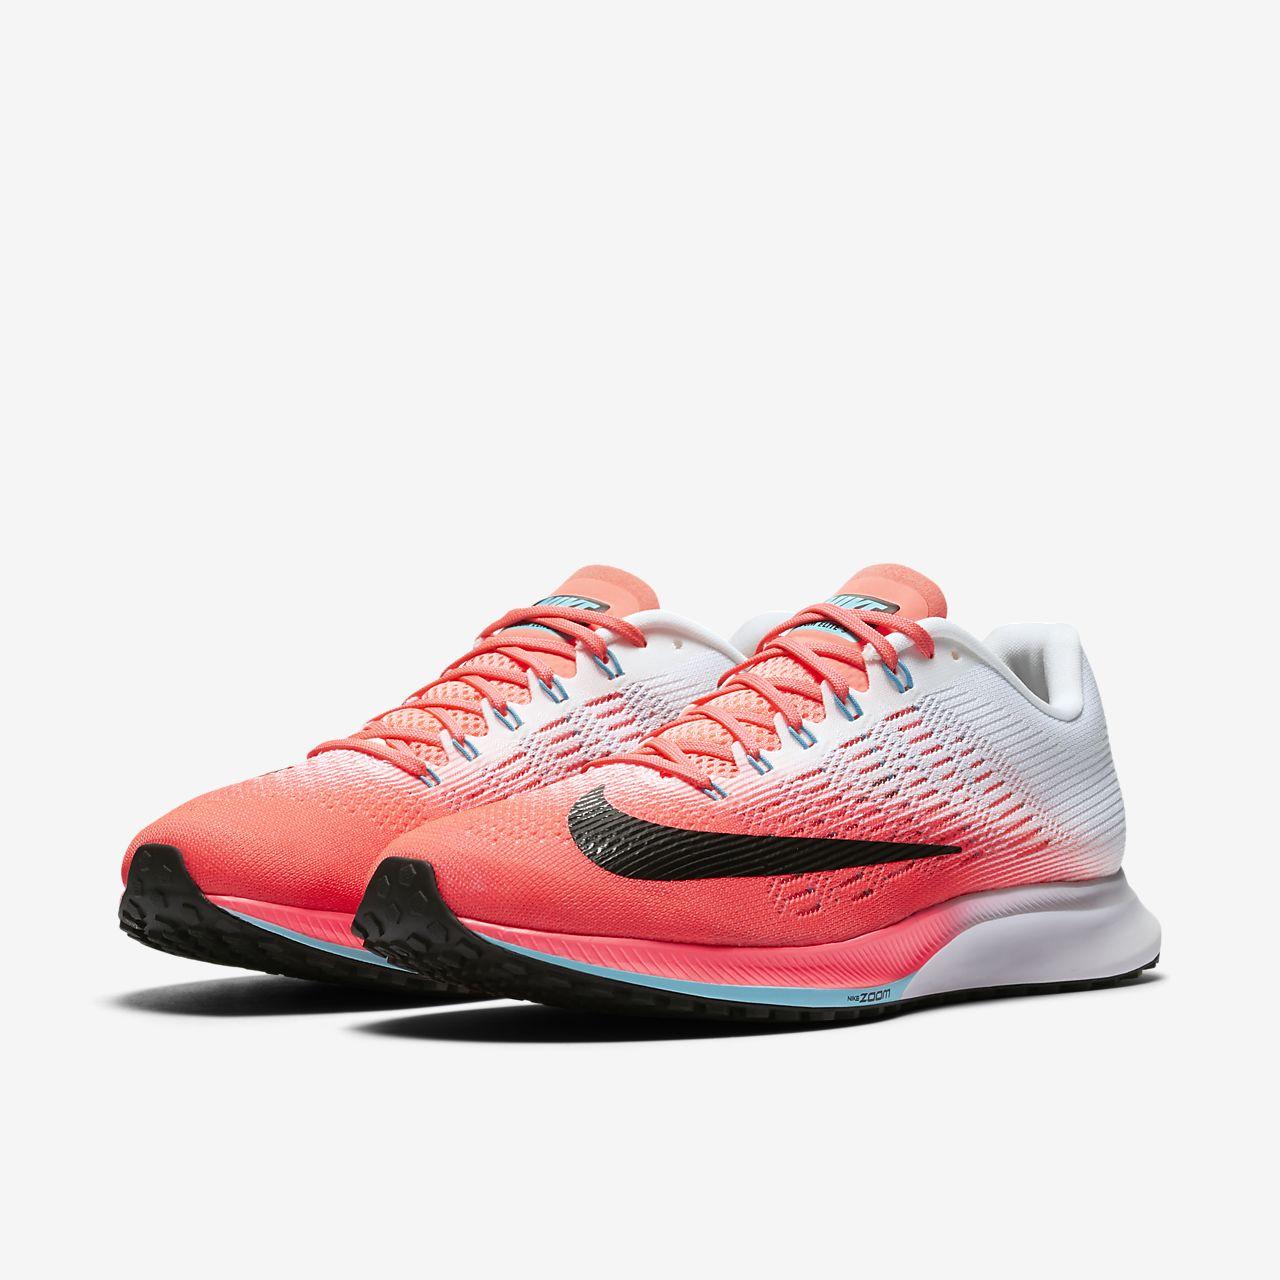 ... Nike Air Zoom Elite 9 Women's Running Shoe